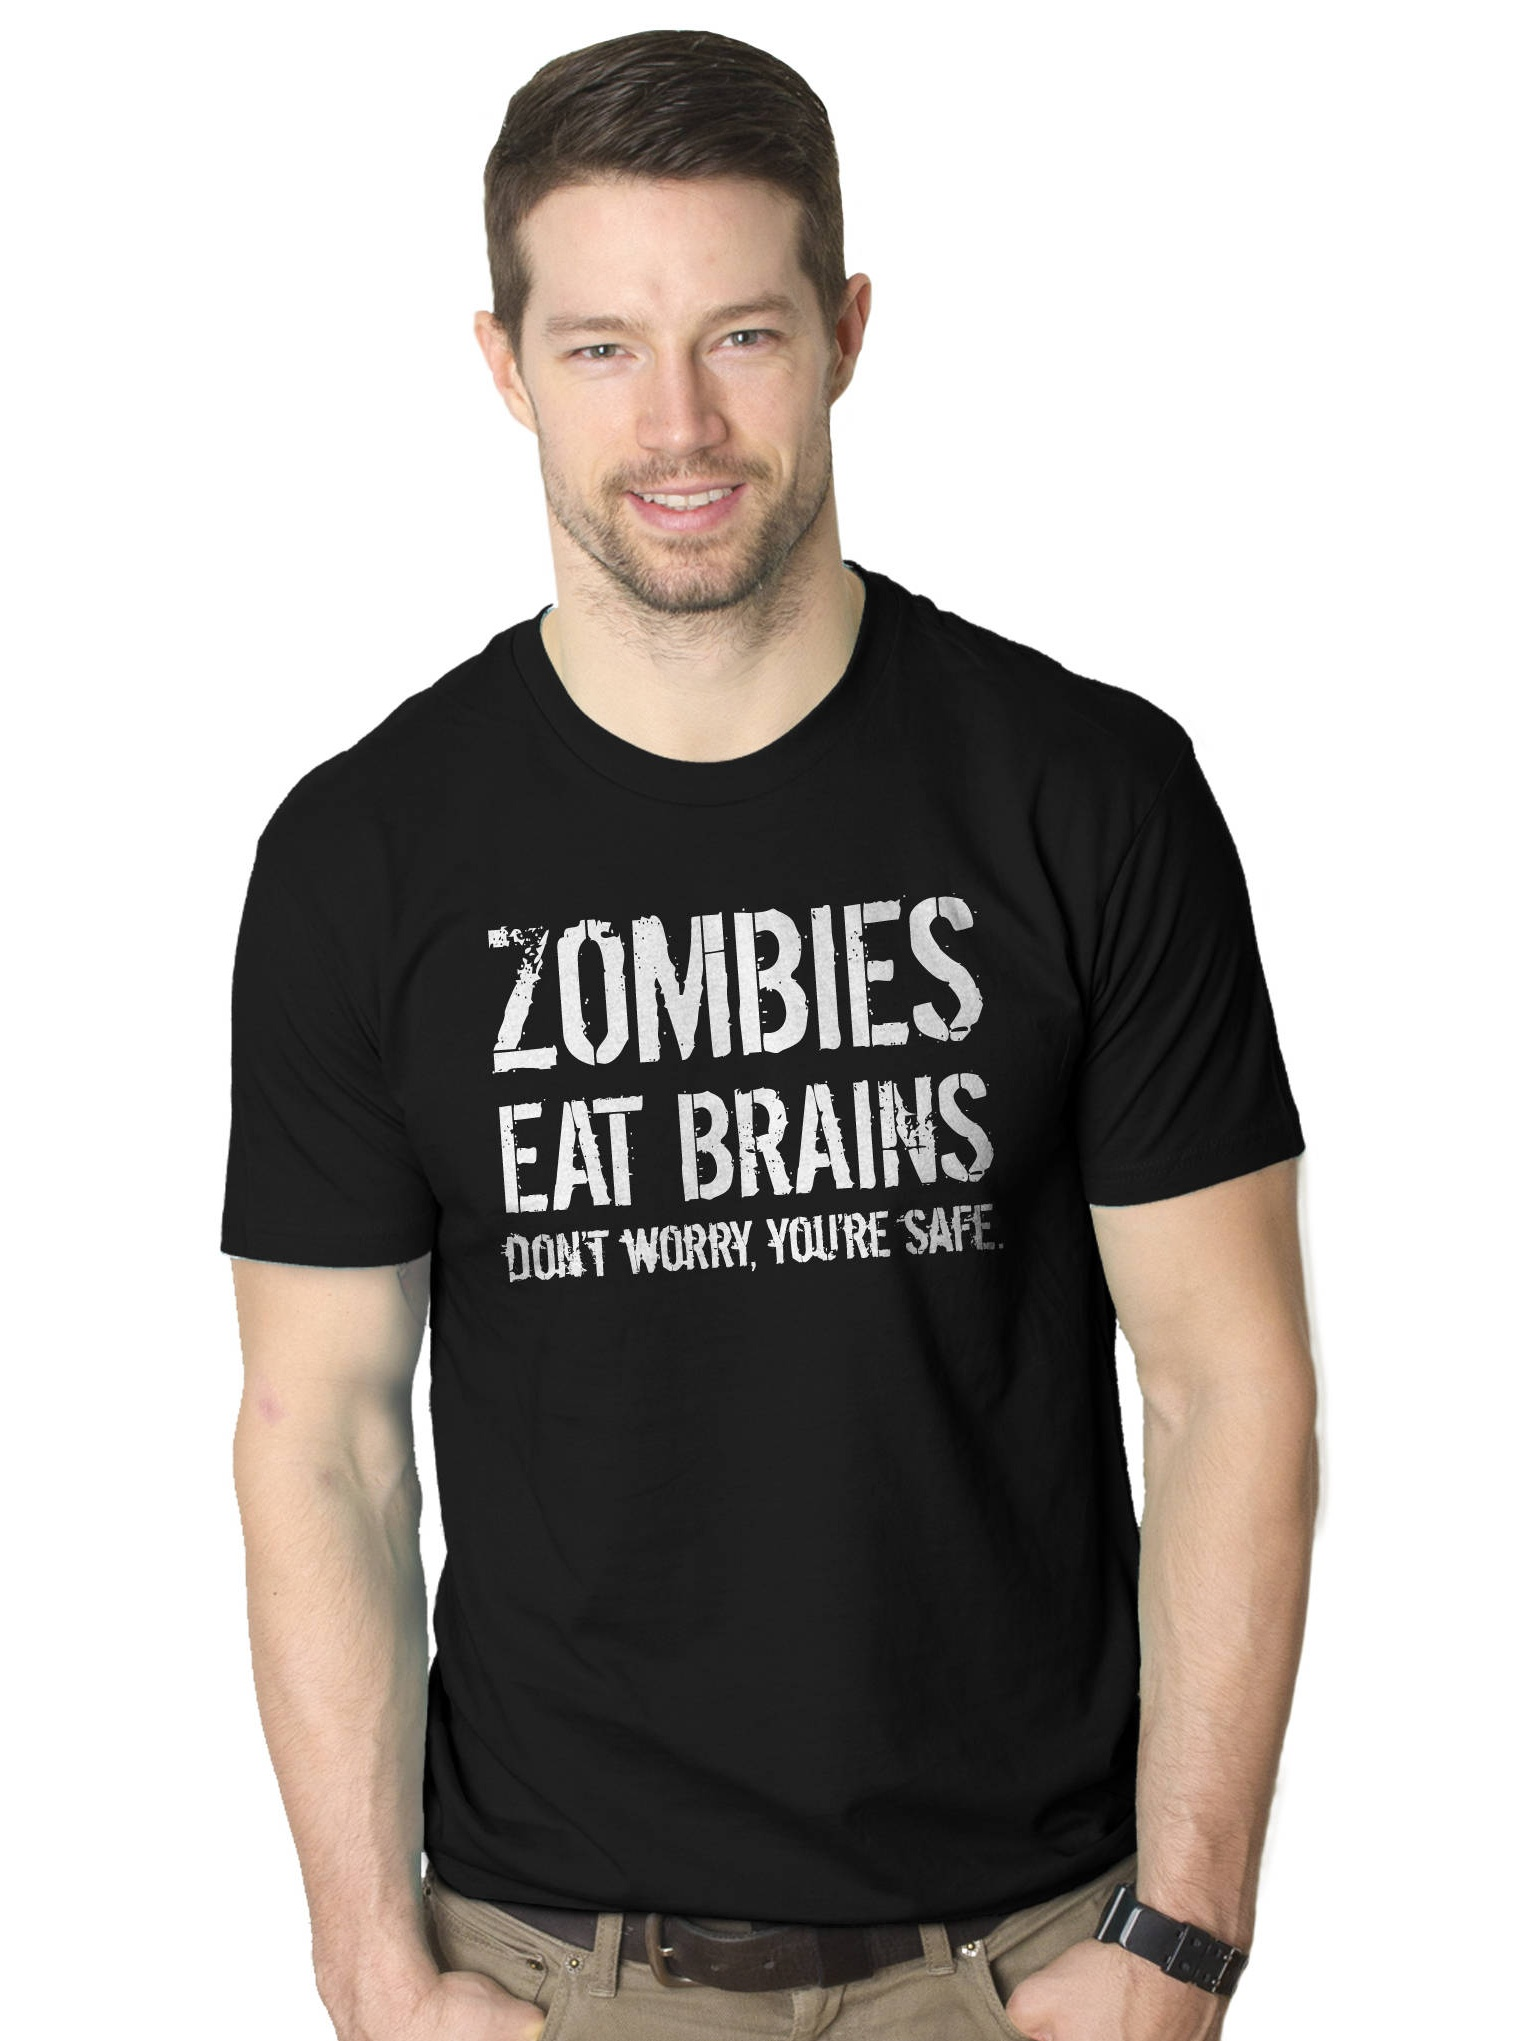 Zombies Eat Brains Youre Safe Mens T Shirt Walking Dead